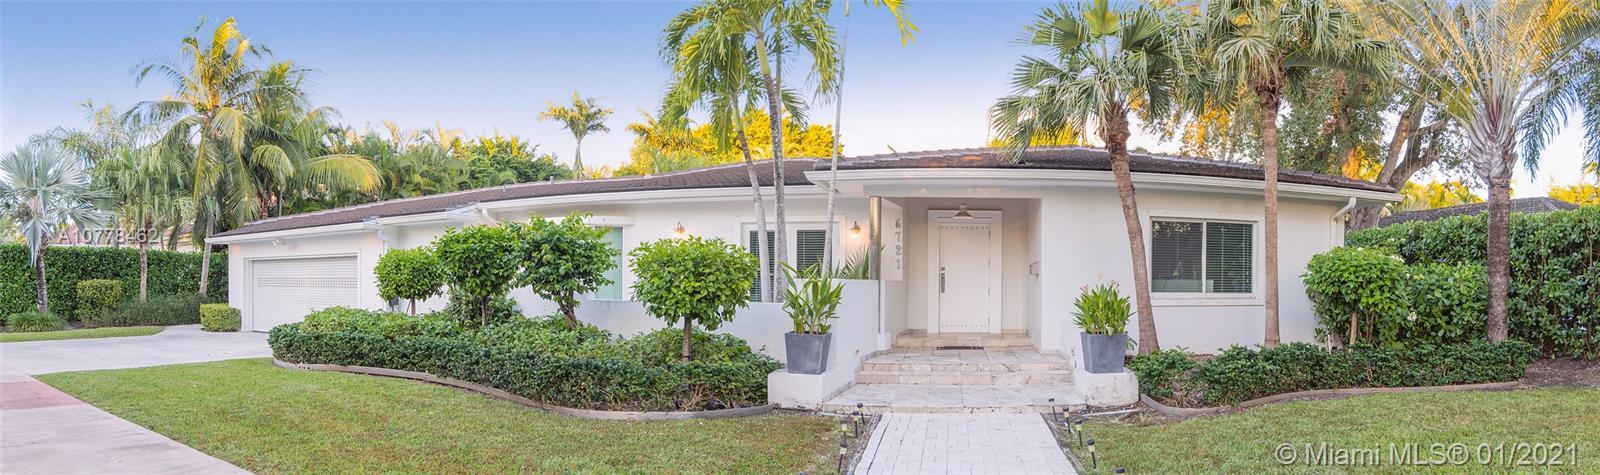 6721  Riviera Dr  For Sale A10778462, FL